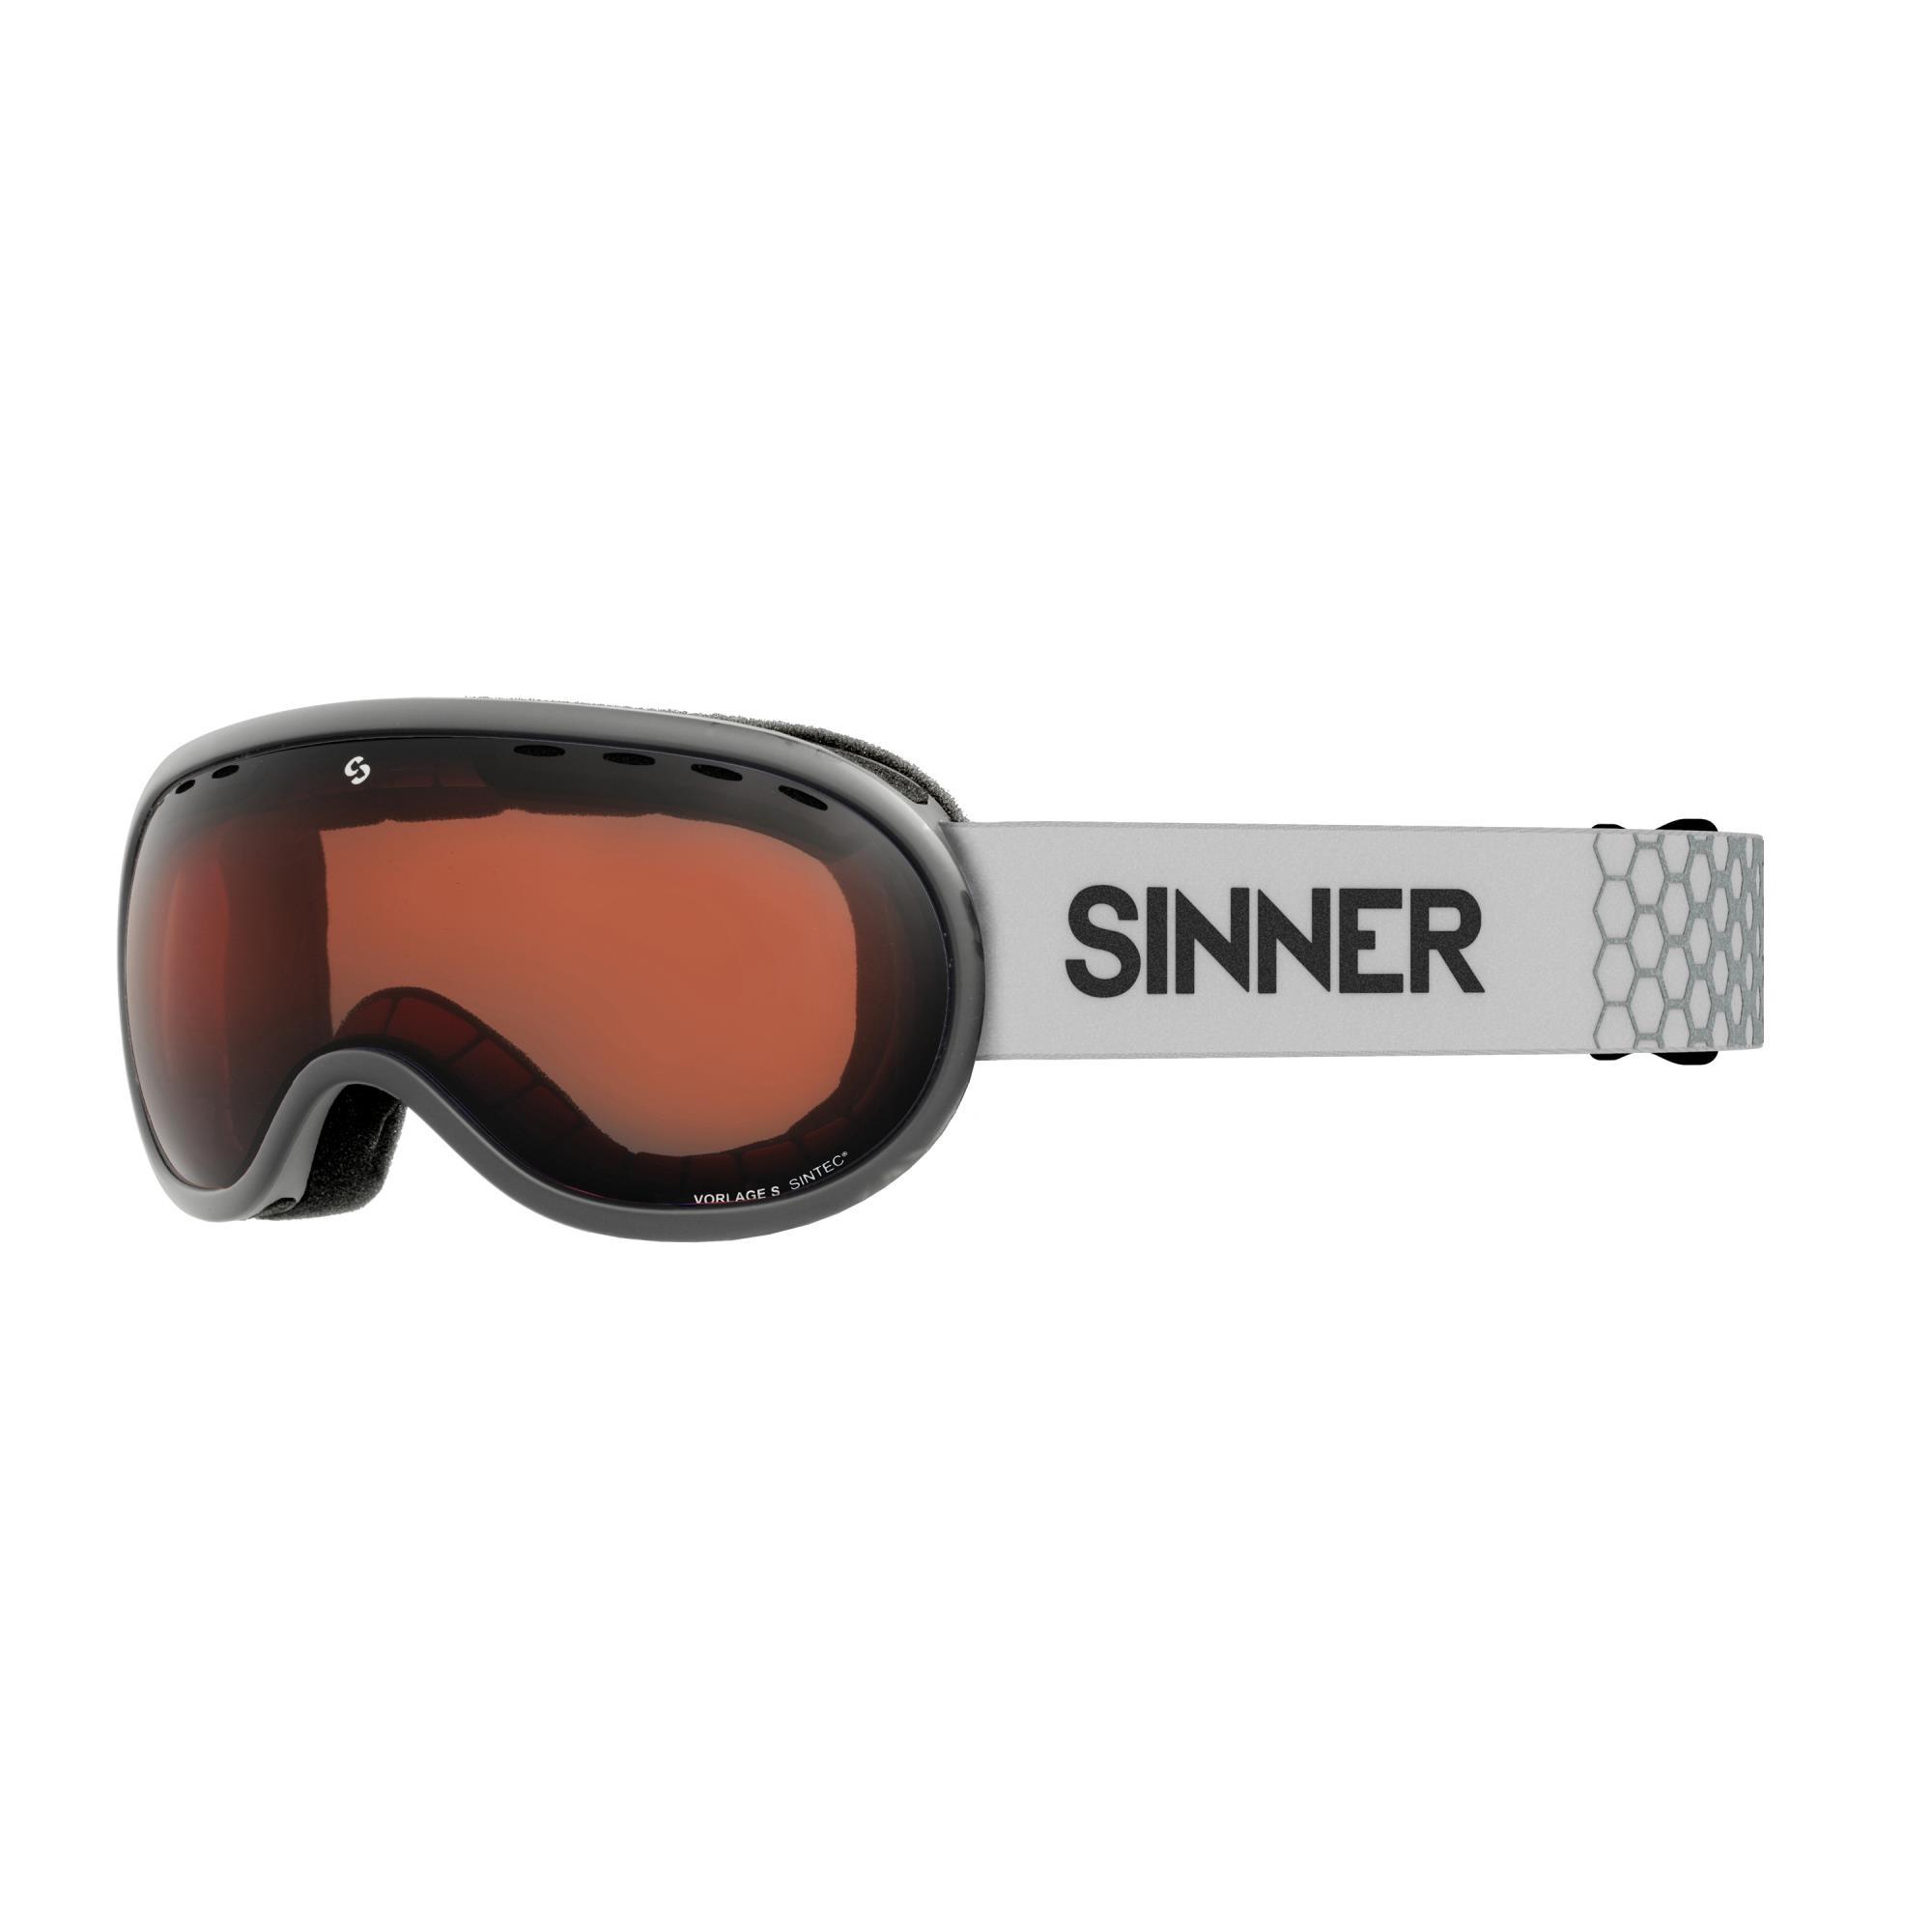 Sinner Vorlage S Skibril - Mat Lichtgrijs Frame -Oranje Sintec®-Lens